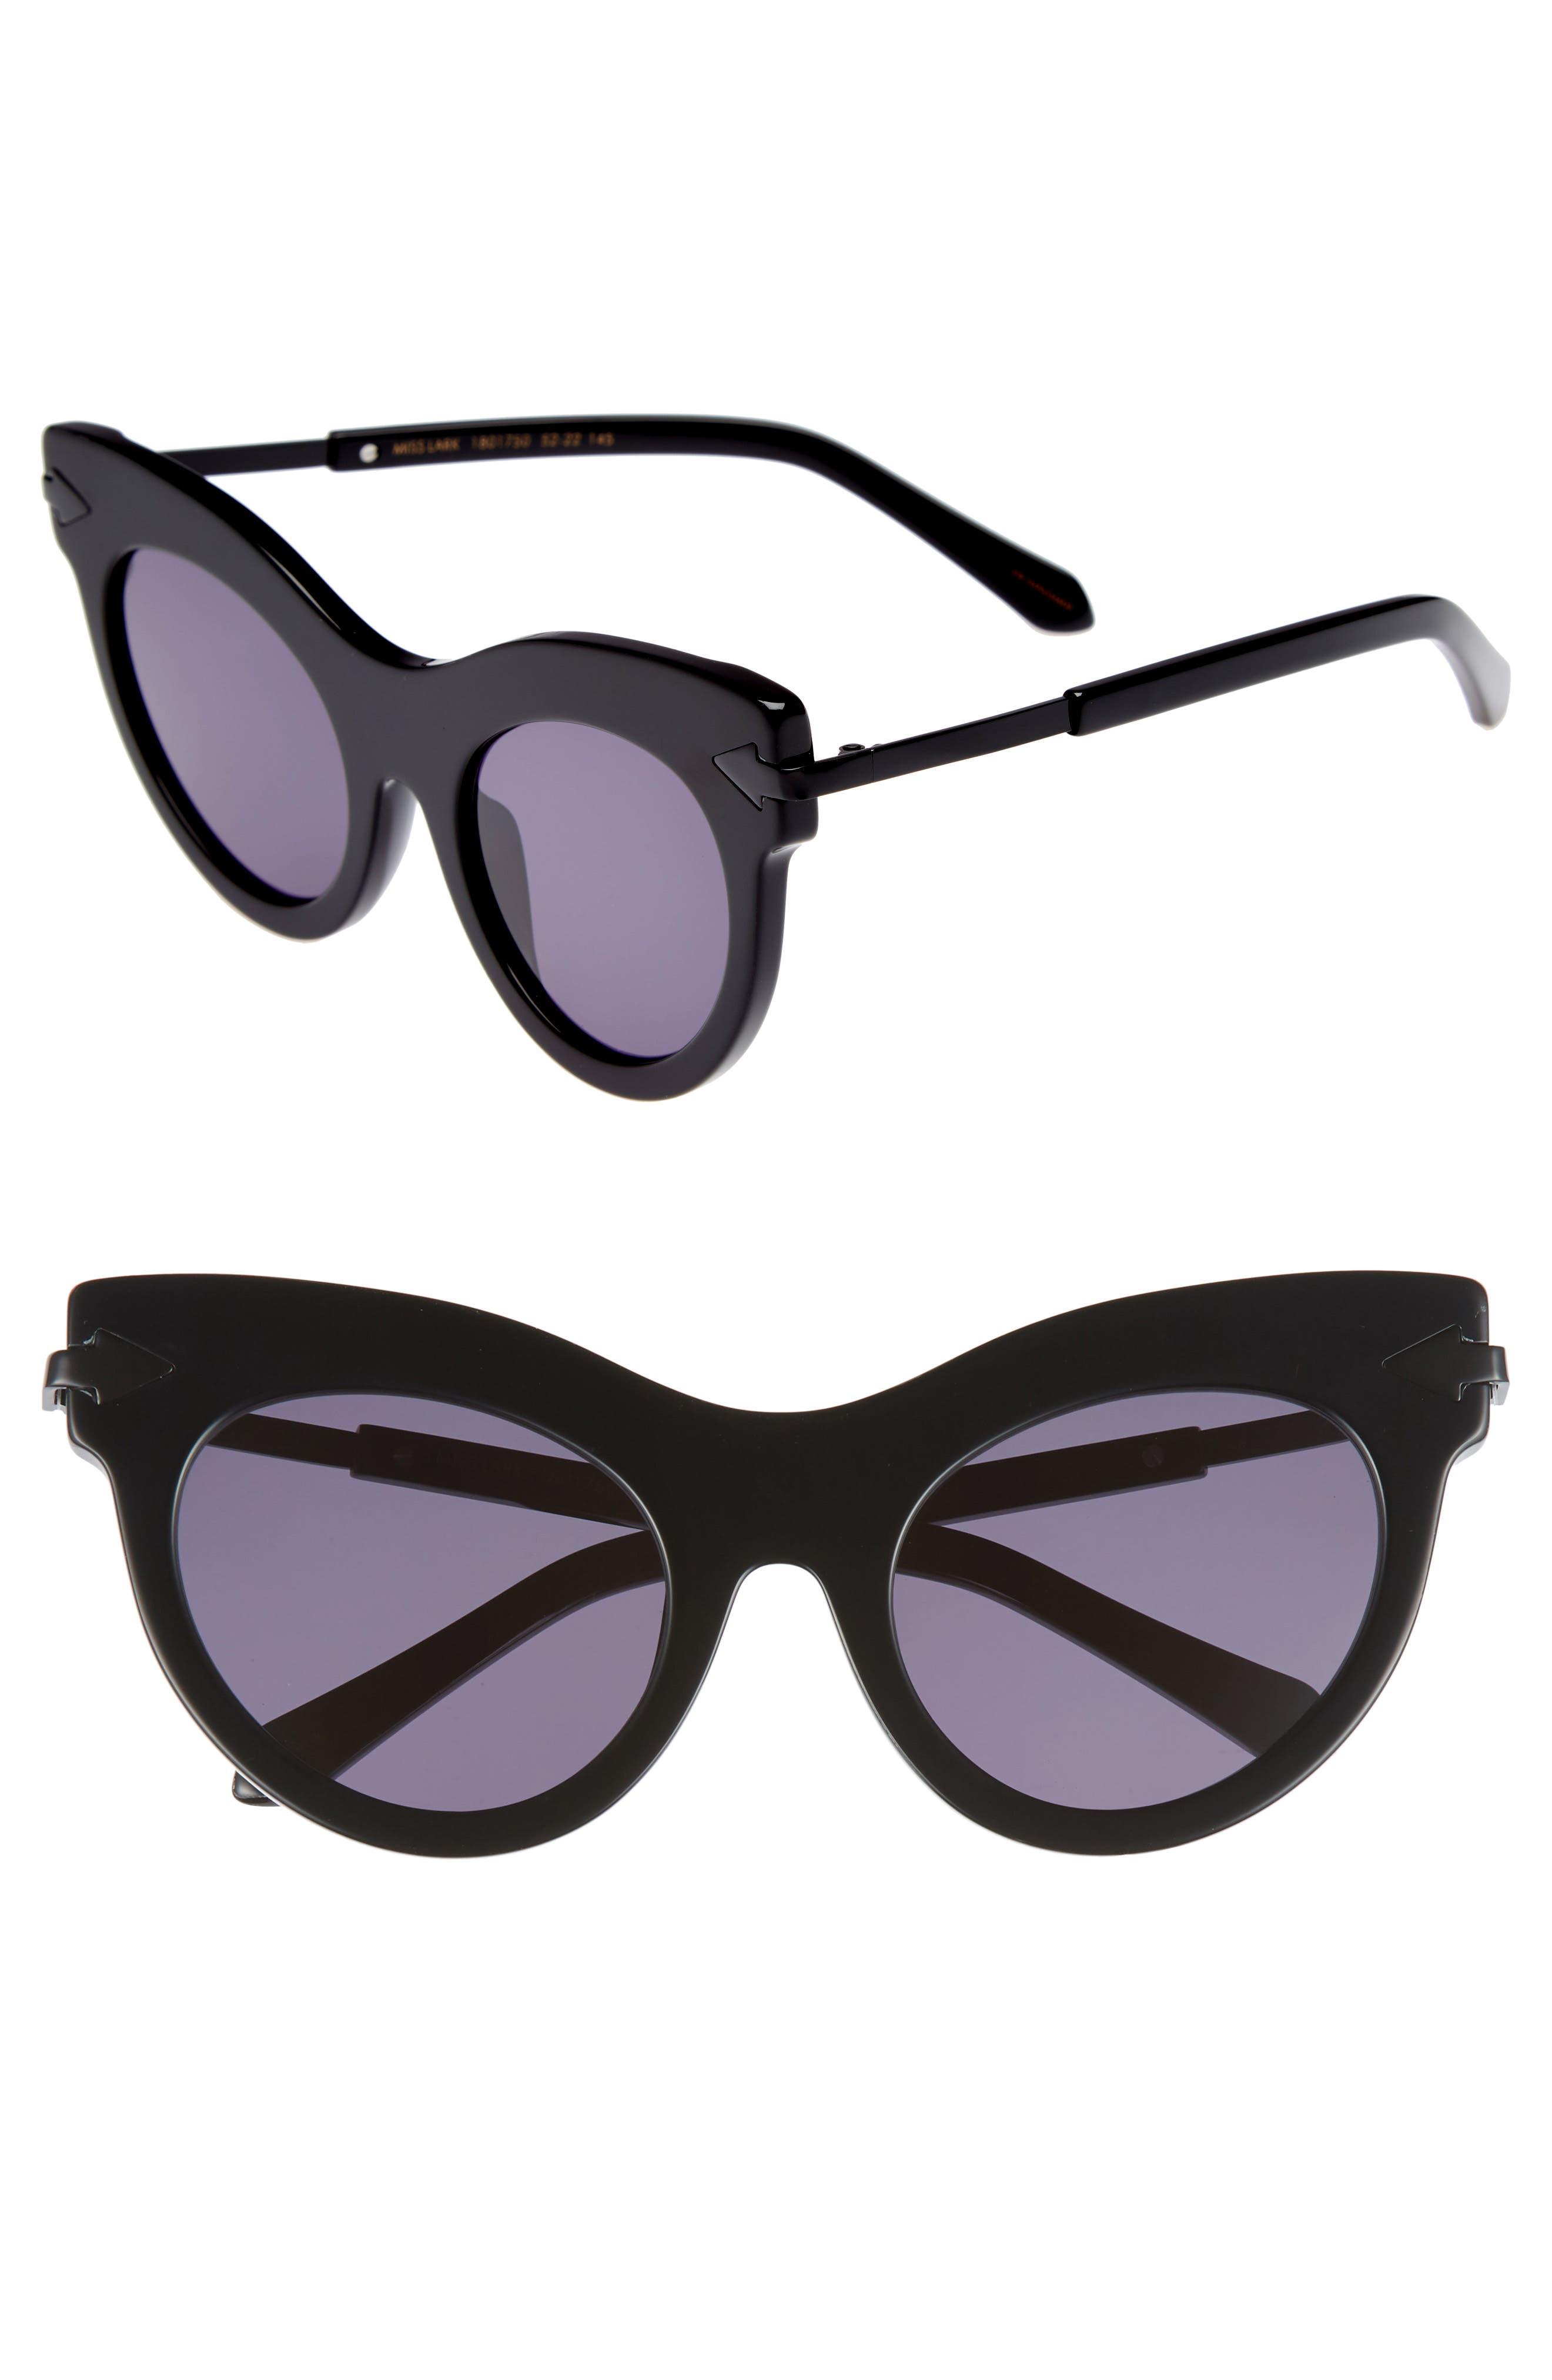 Miss Lark 52mm Cat Eye Sunglasses,                             Main thumbnail 1, color,                             Black